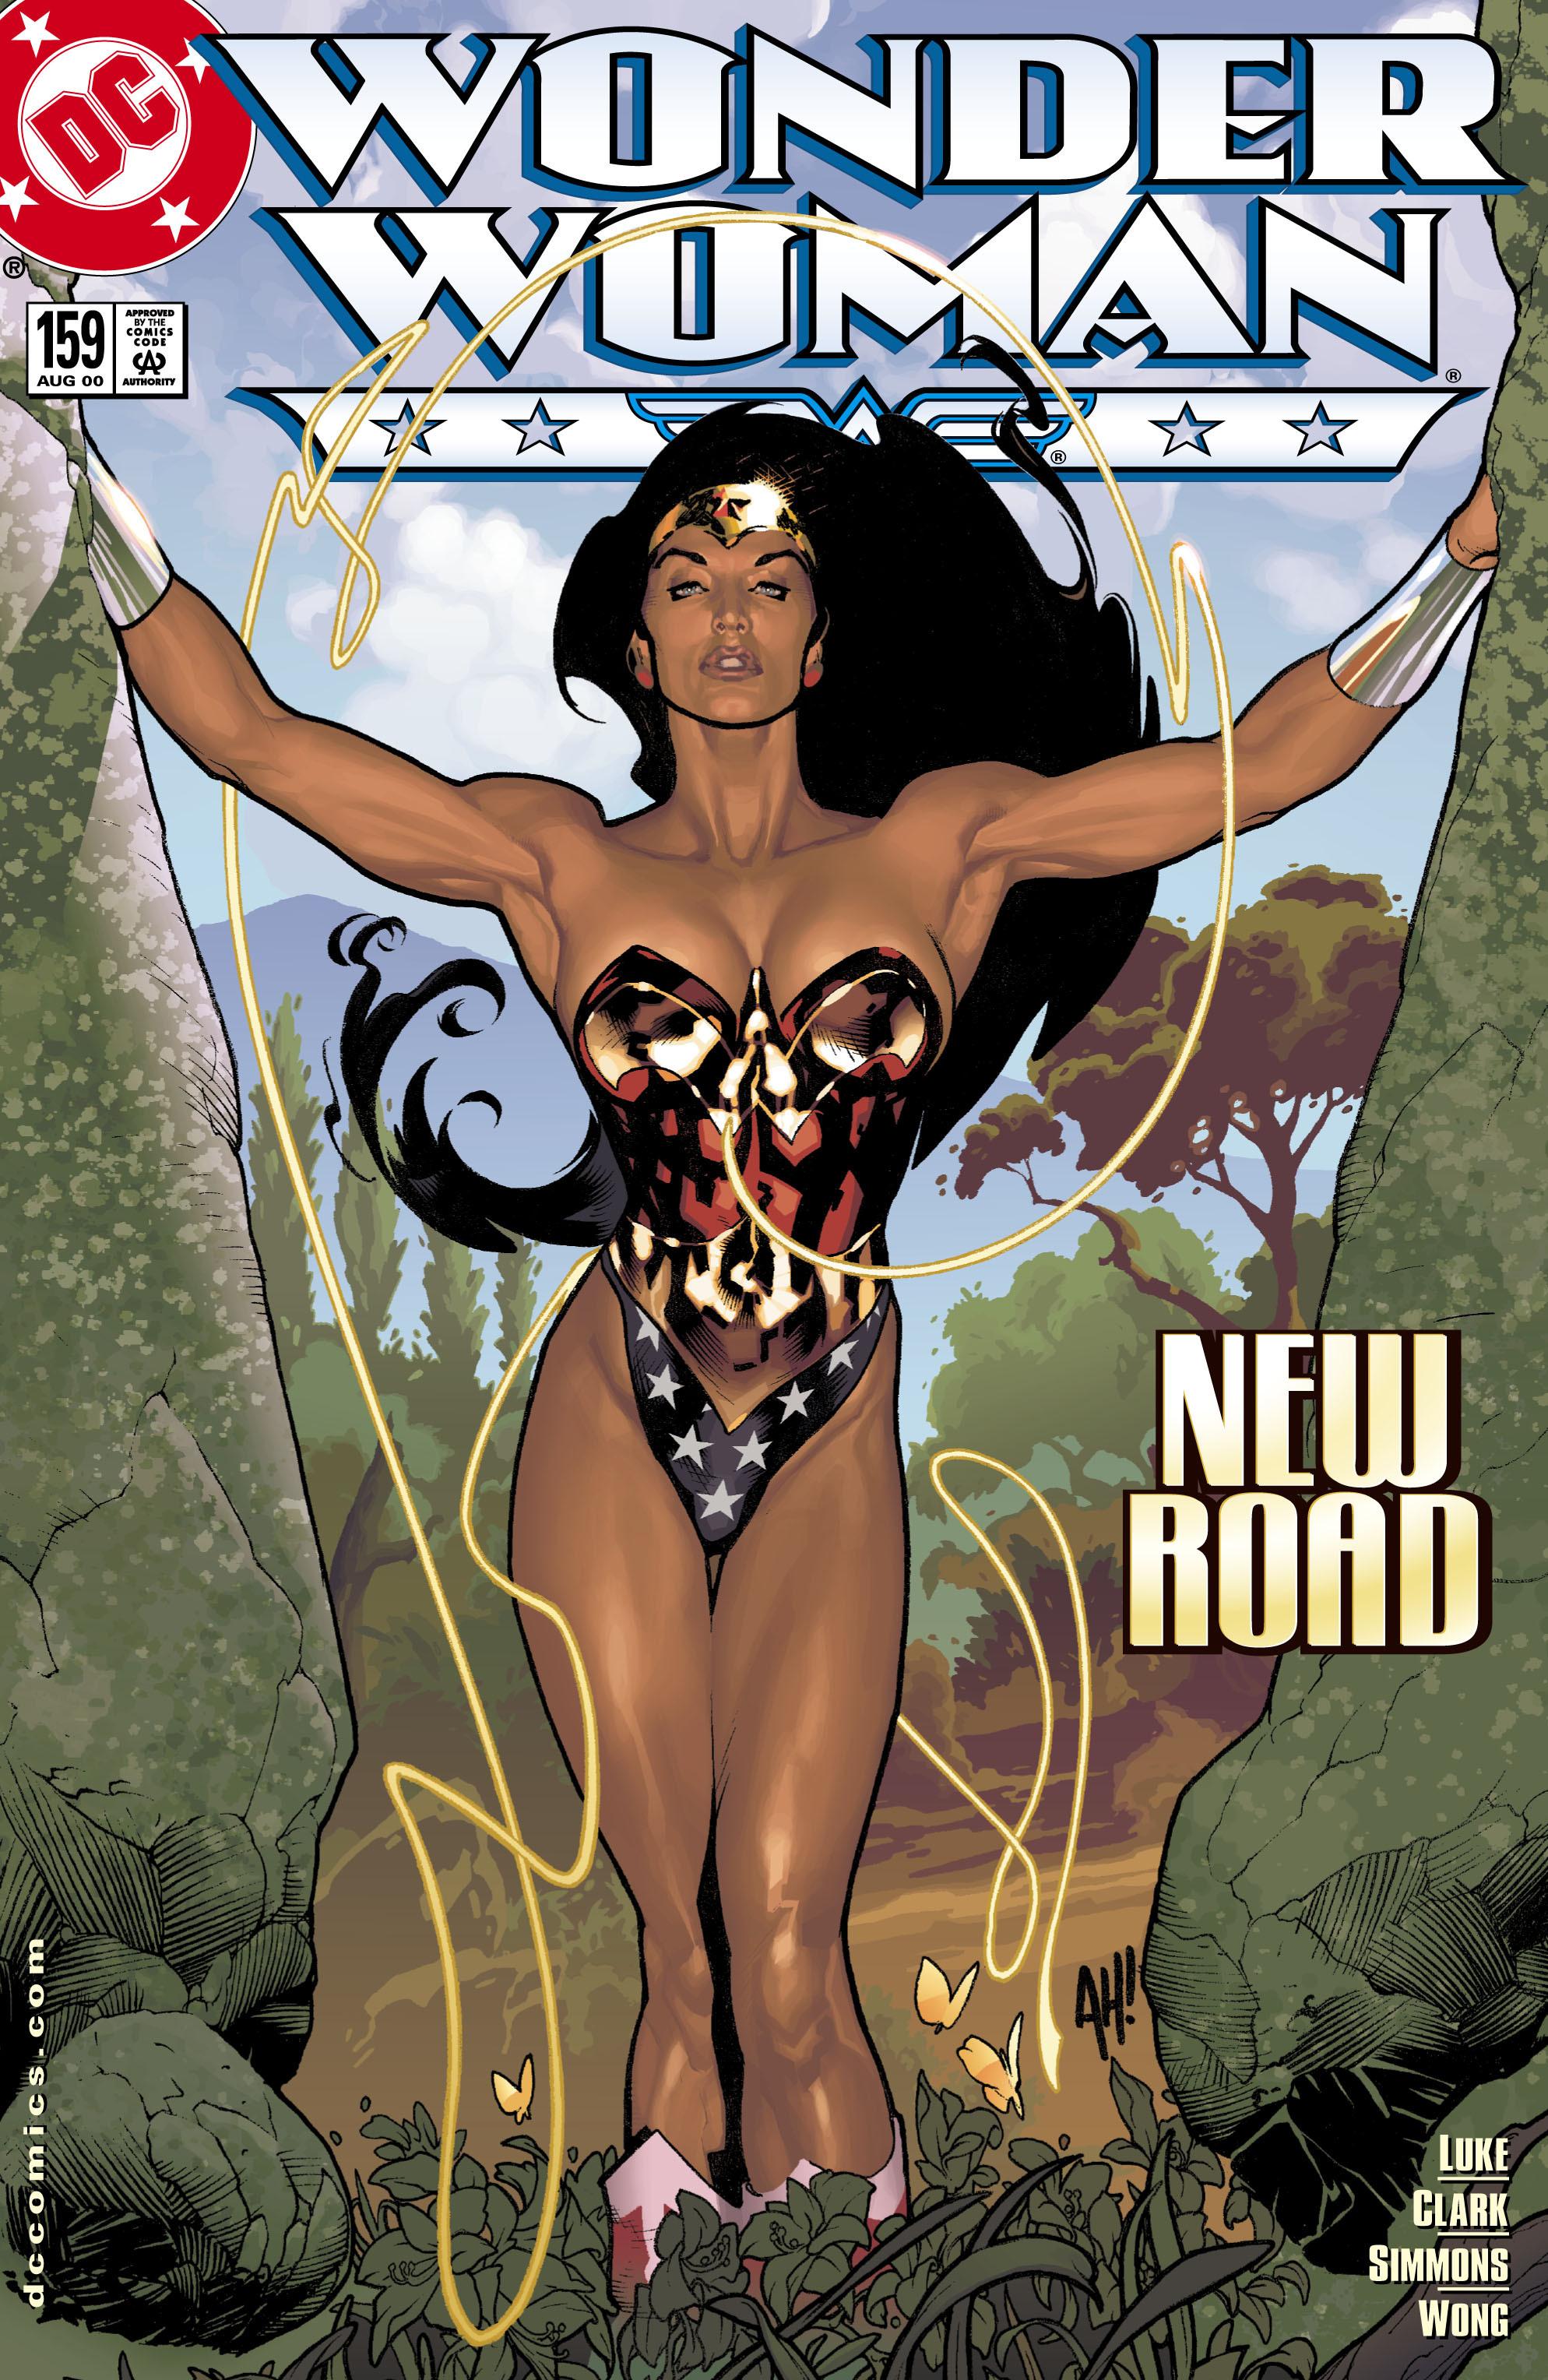 Read online Wonder Woman (1987) comic -  Issue #159 - 1